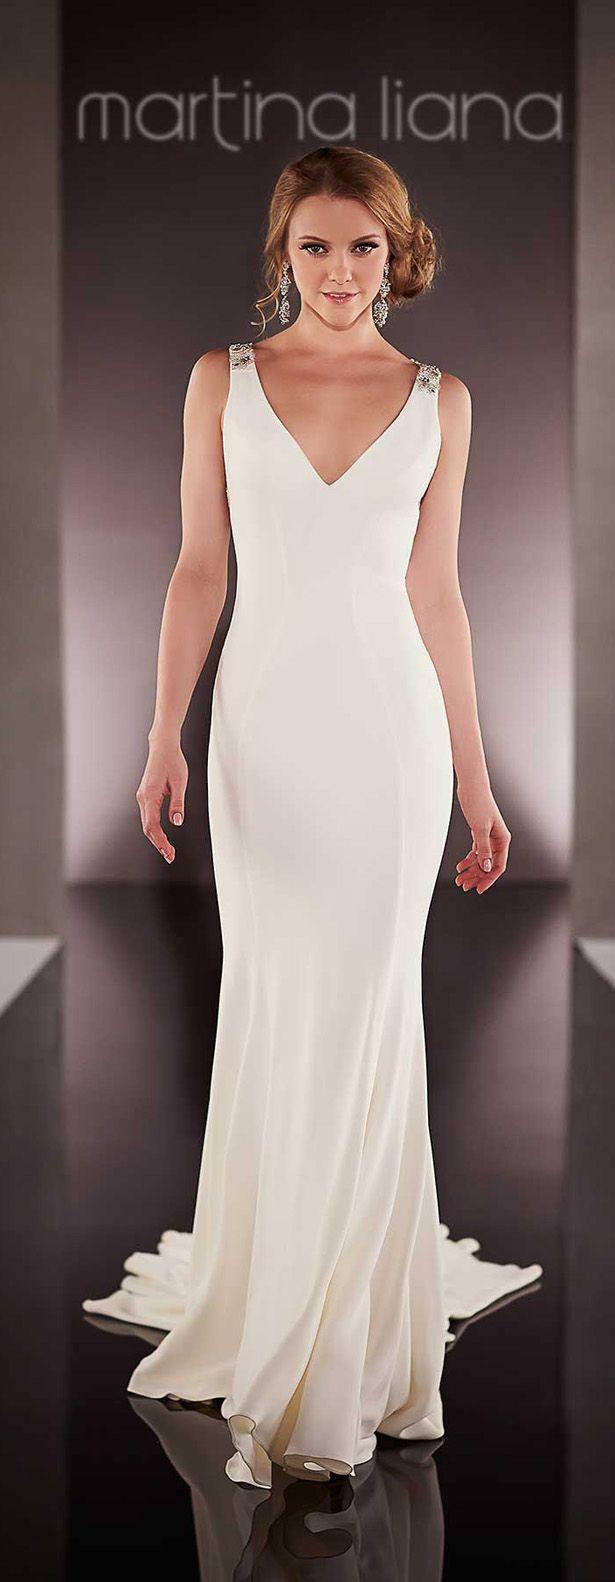 martina-liana-wedding-dresses-2016-728_alt1_zoom - Belle The Magazine